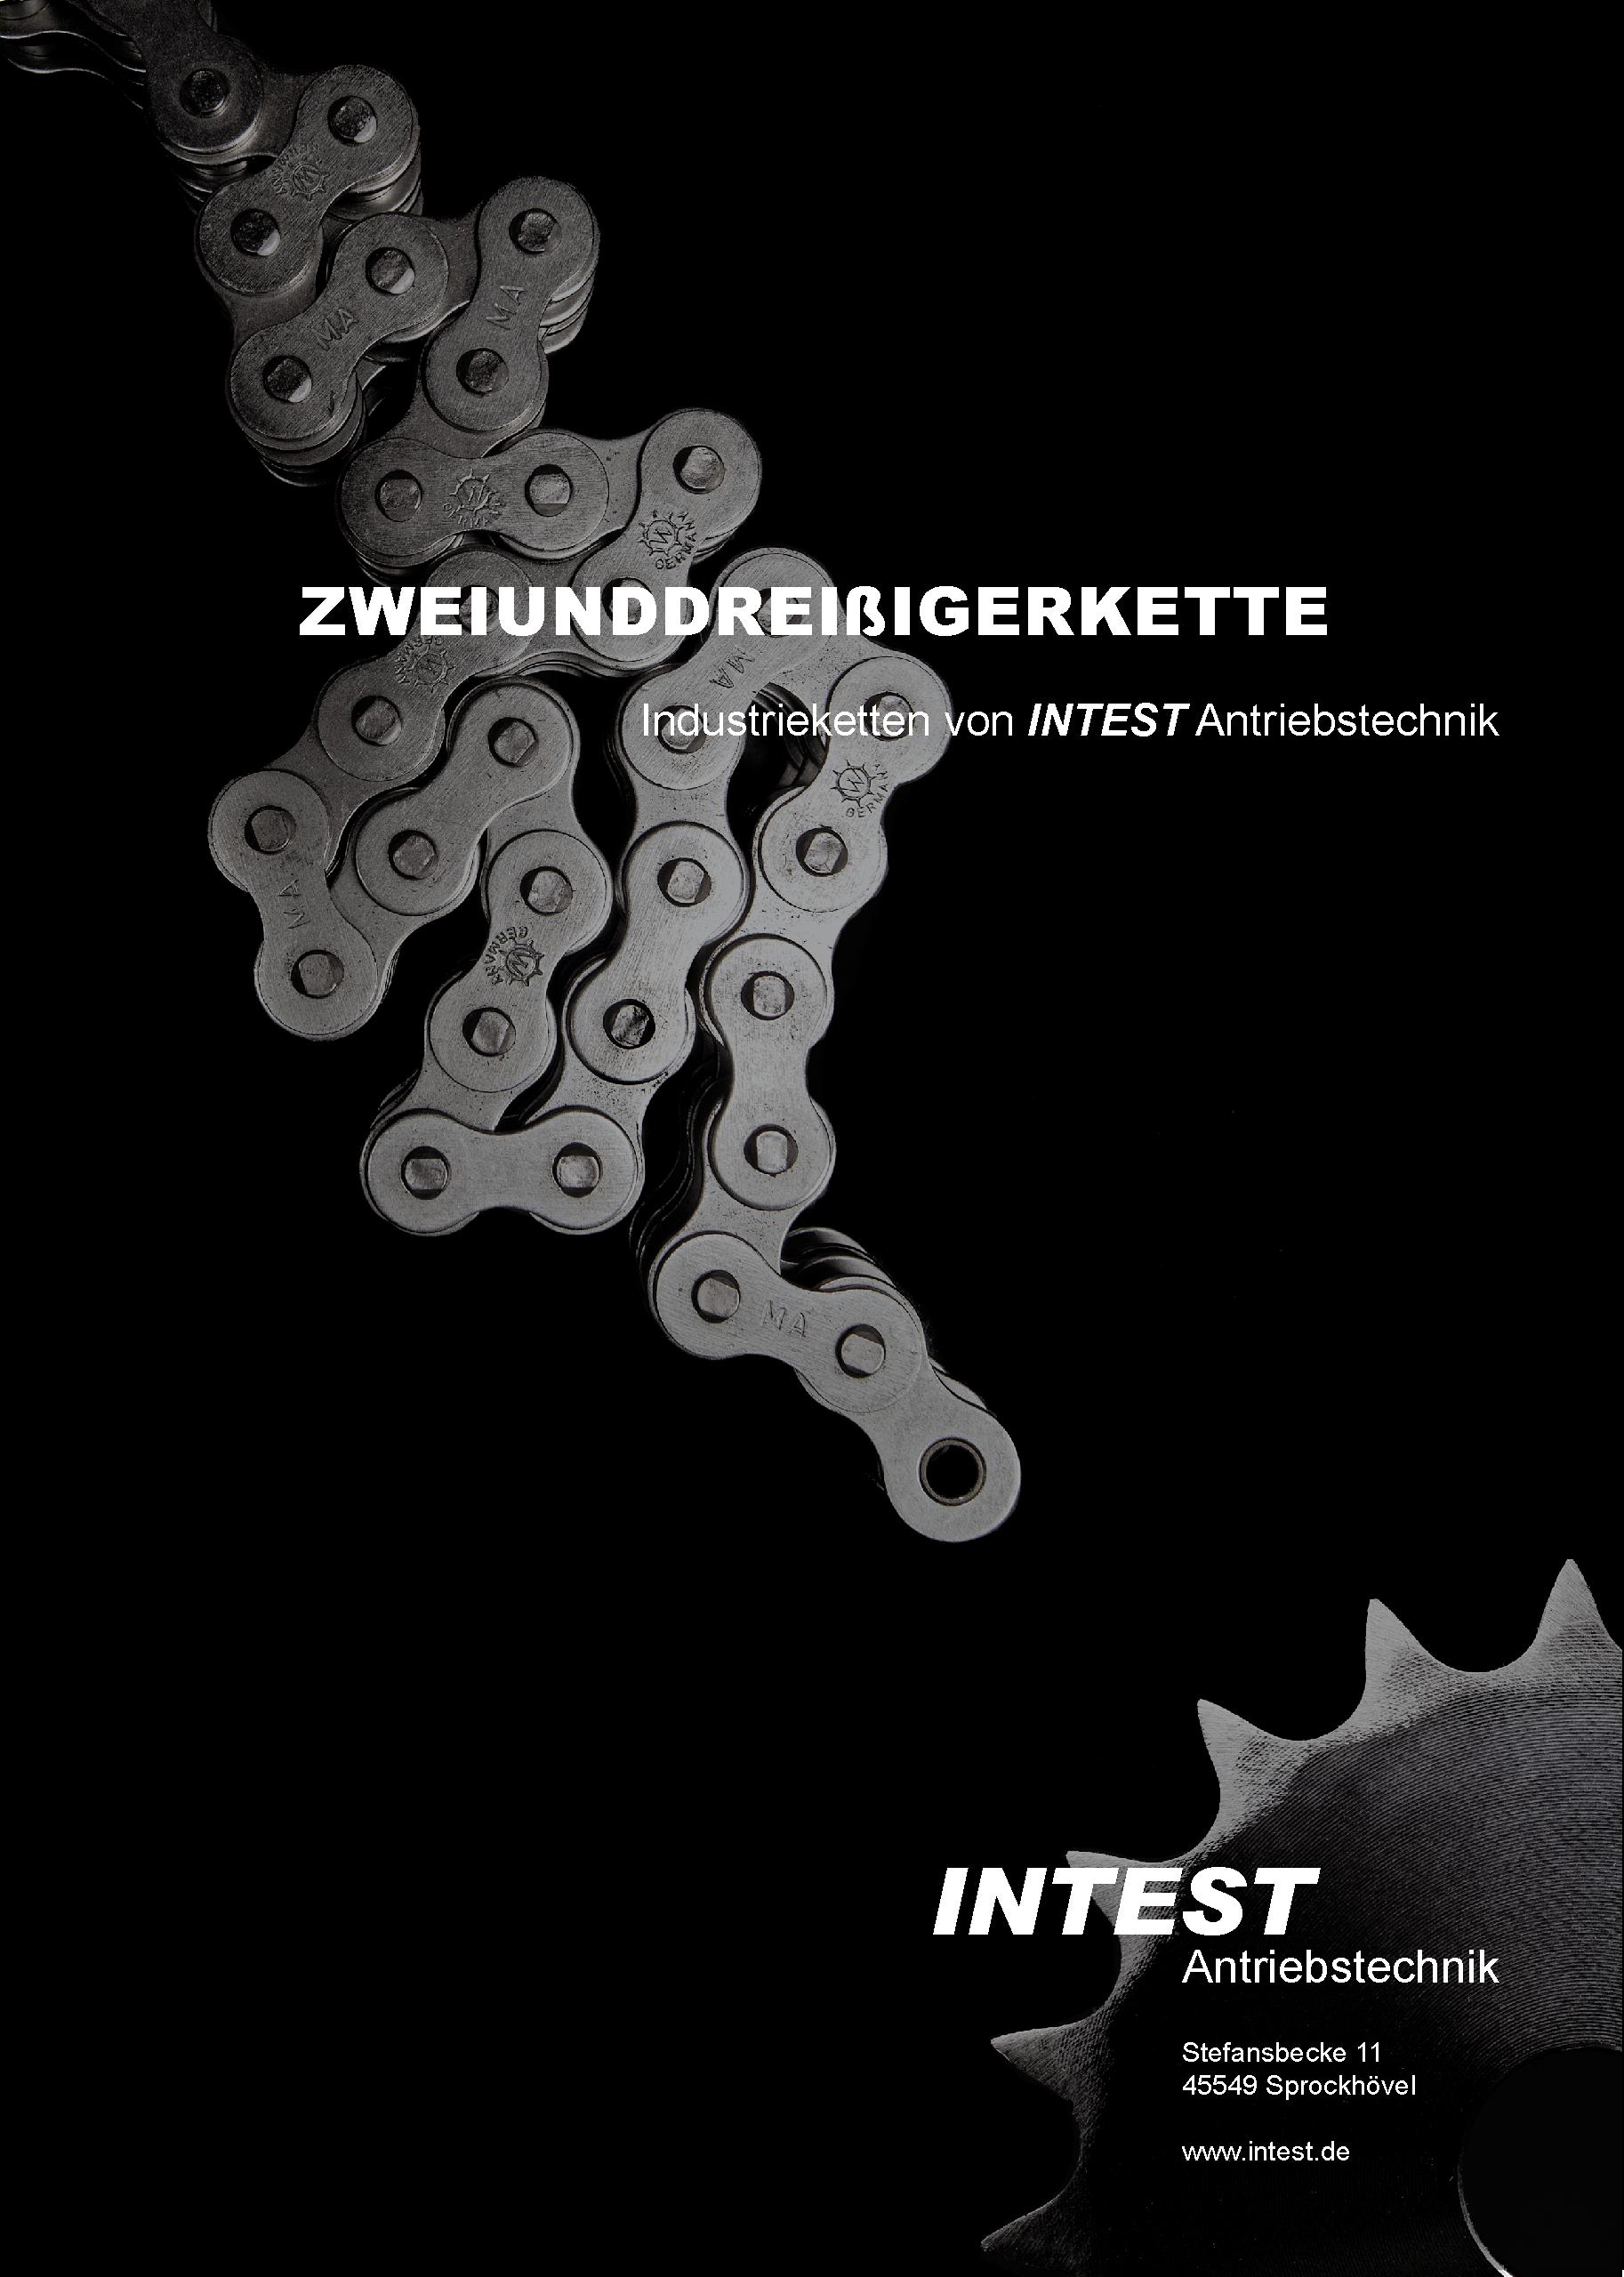 Anzeige_Industrieketten.png